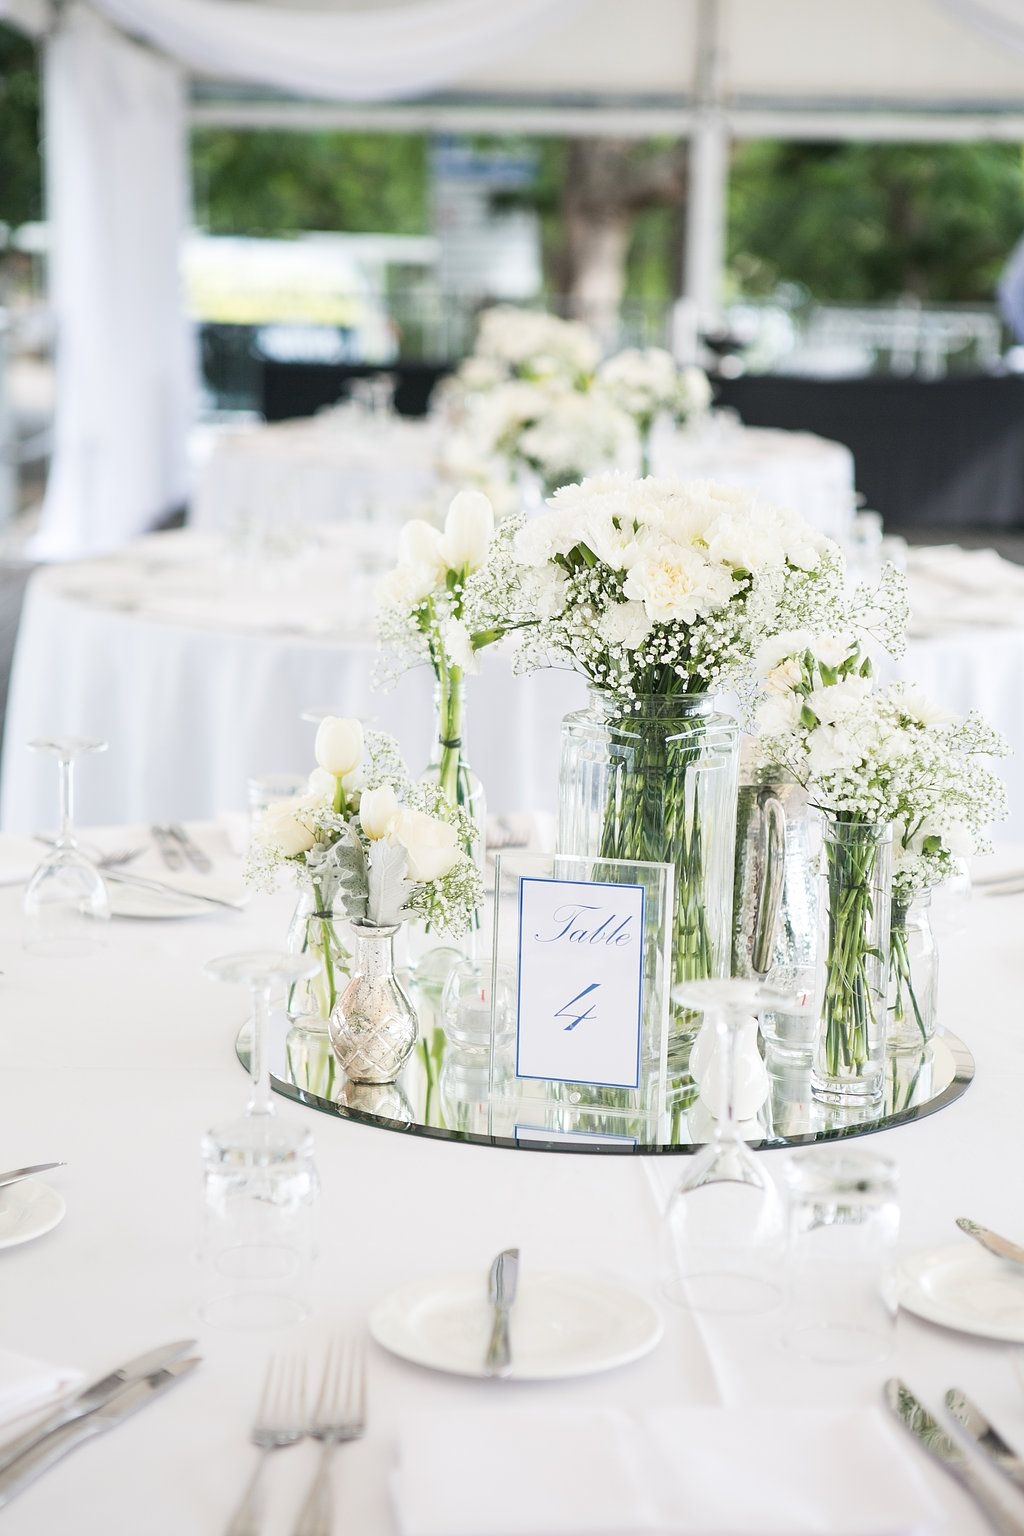 White Wedding Table Flowers Mirror Base White Table Setting